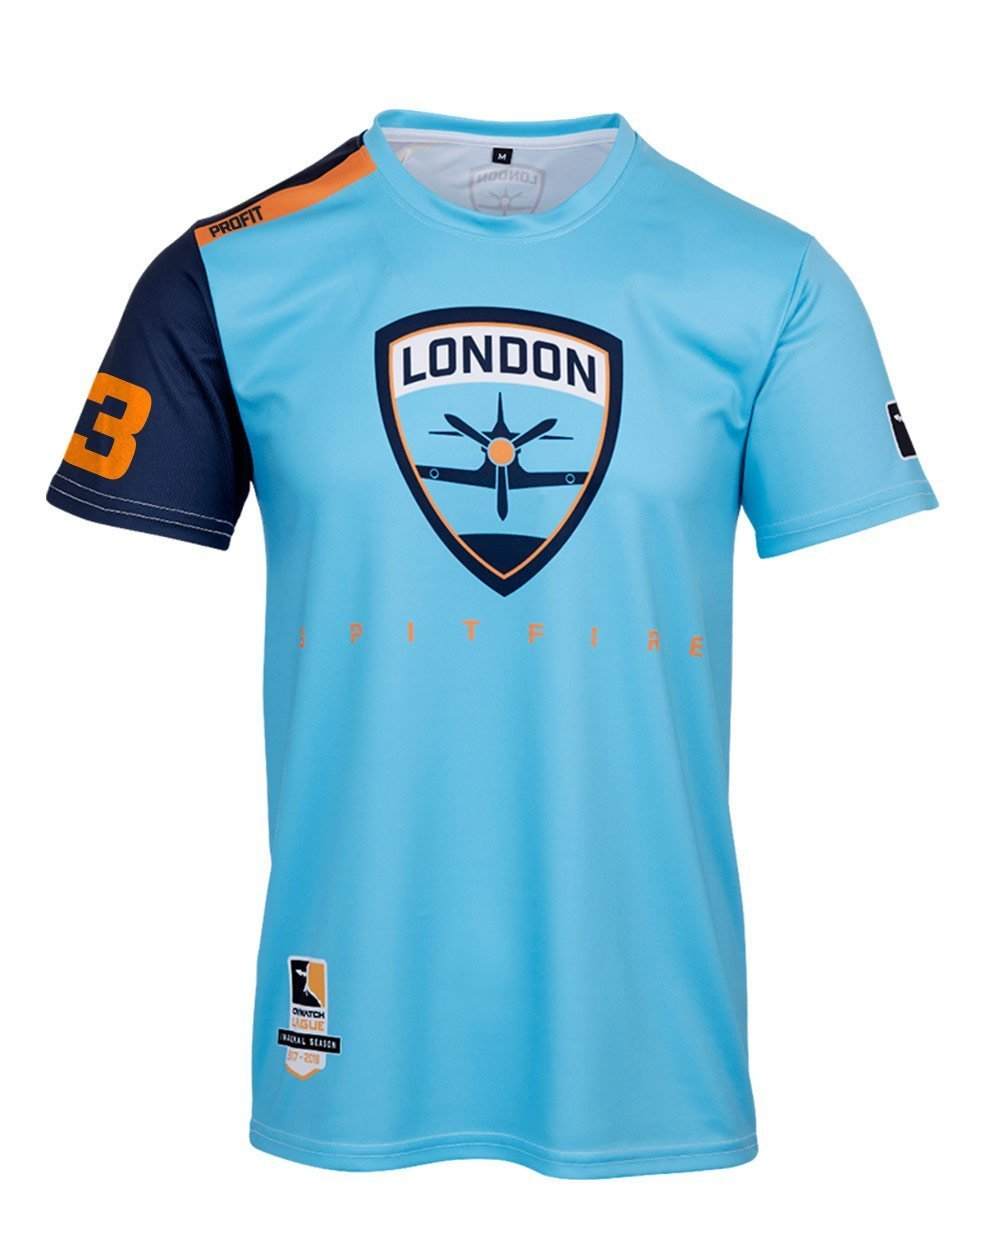 LondonSpitfireHome_Profit_Mens_Jersey_Front